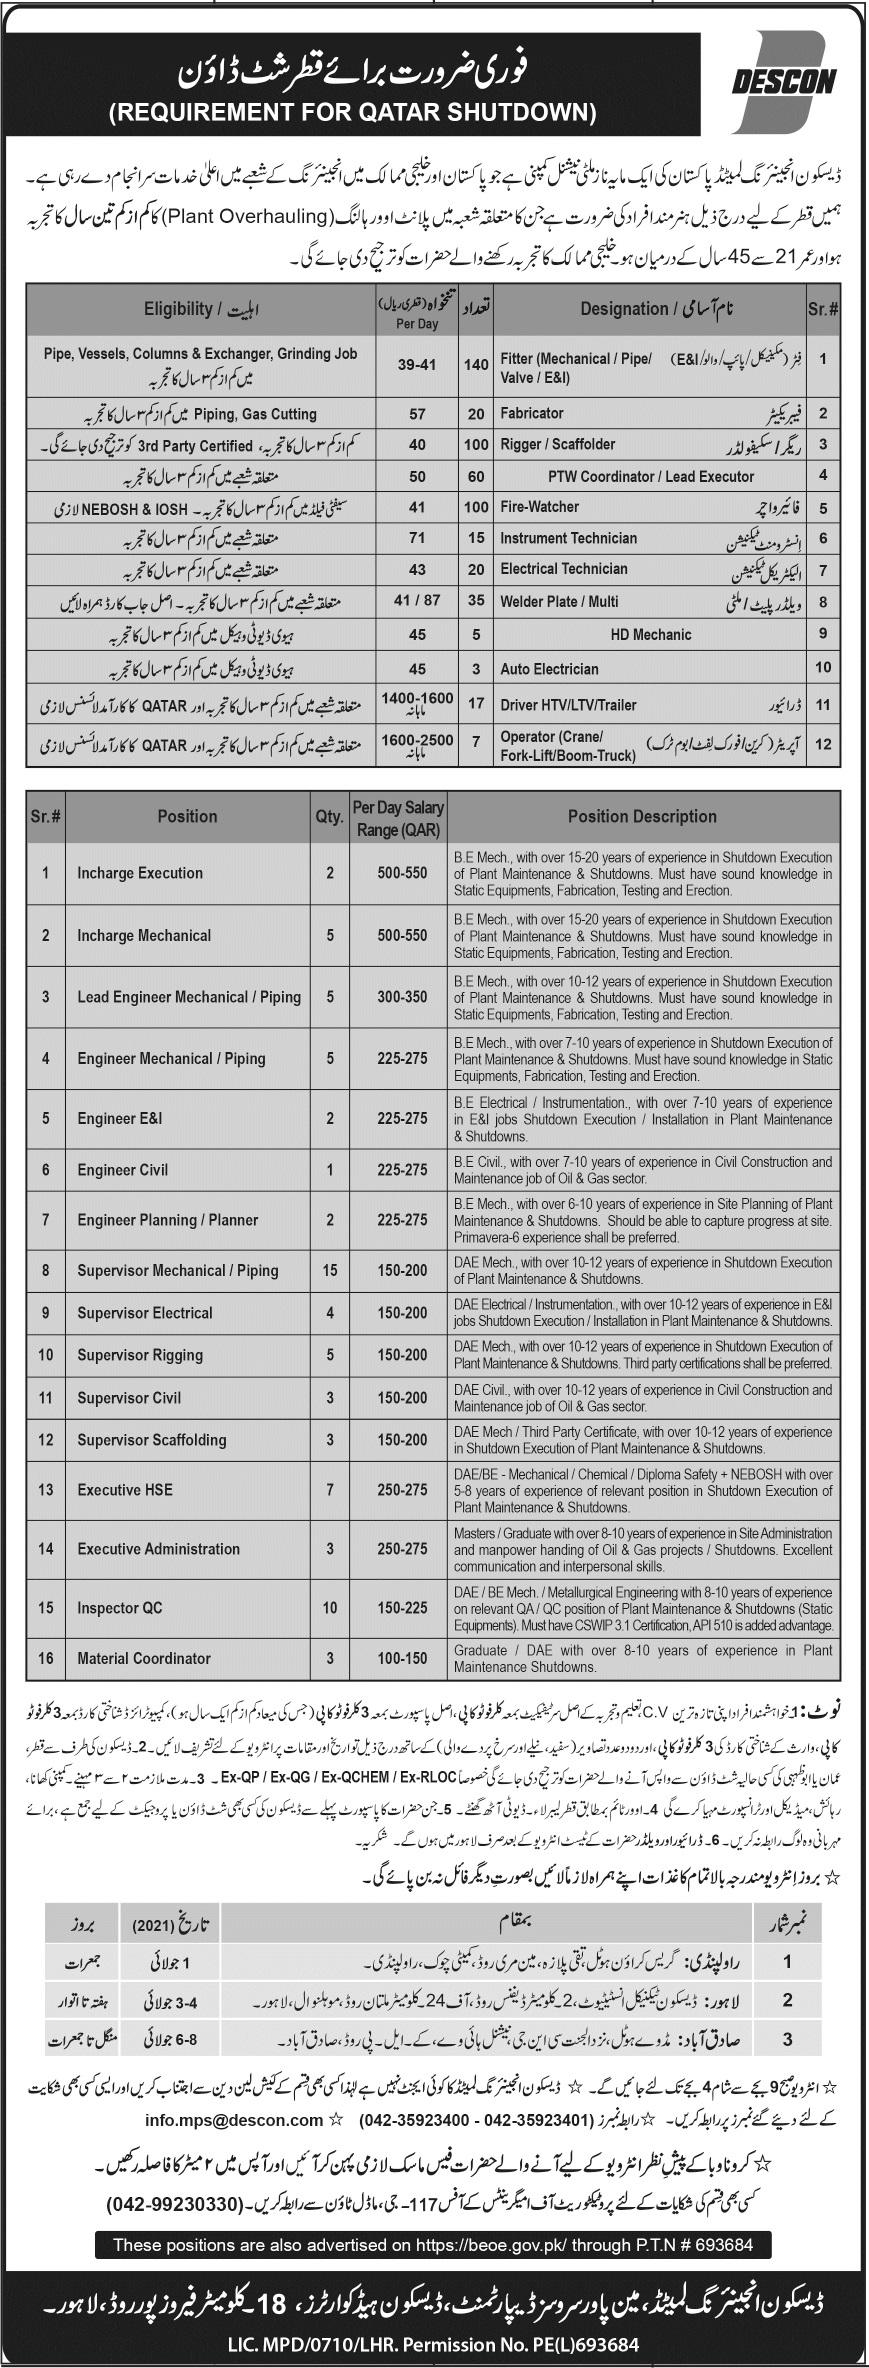 Descon Engineering Limited Jobs 2021 in Qatar